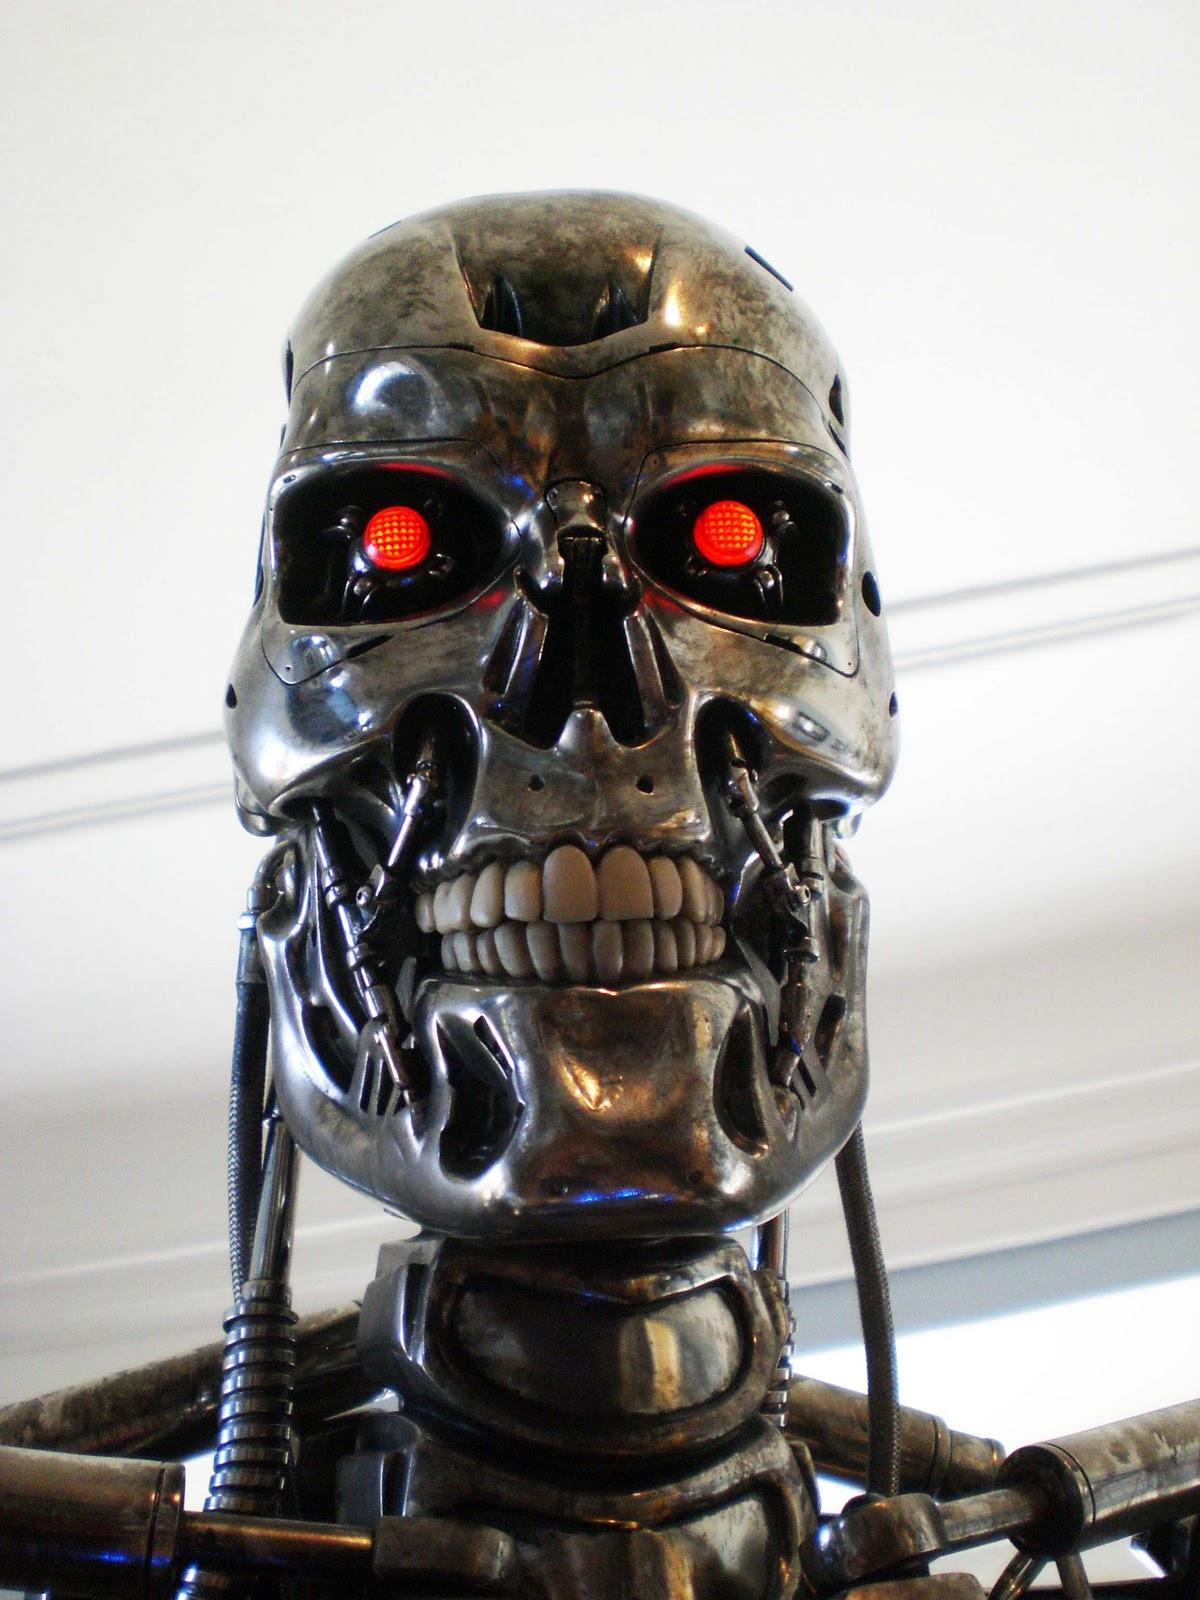 http://3.bp.blogspot.com/-jvP9WxfwP9s/TrLqcXCr8lI/AAAAAAAAevE/YjqzP17Y-Oo/s1600/T-800_Skull.jpg